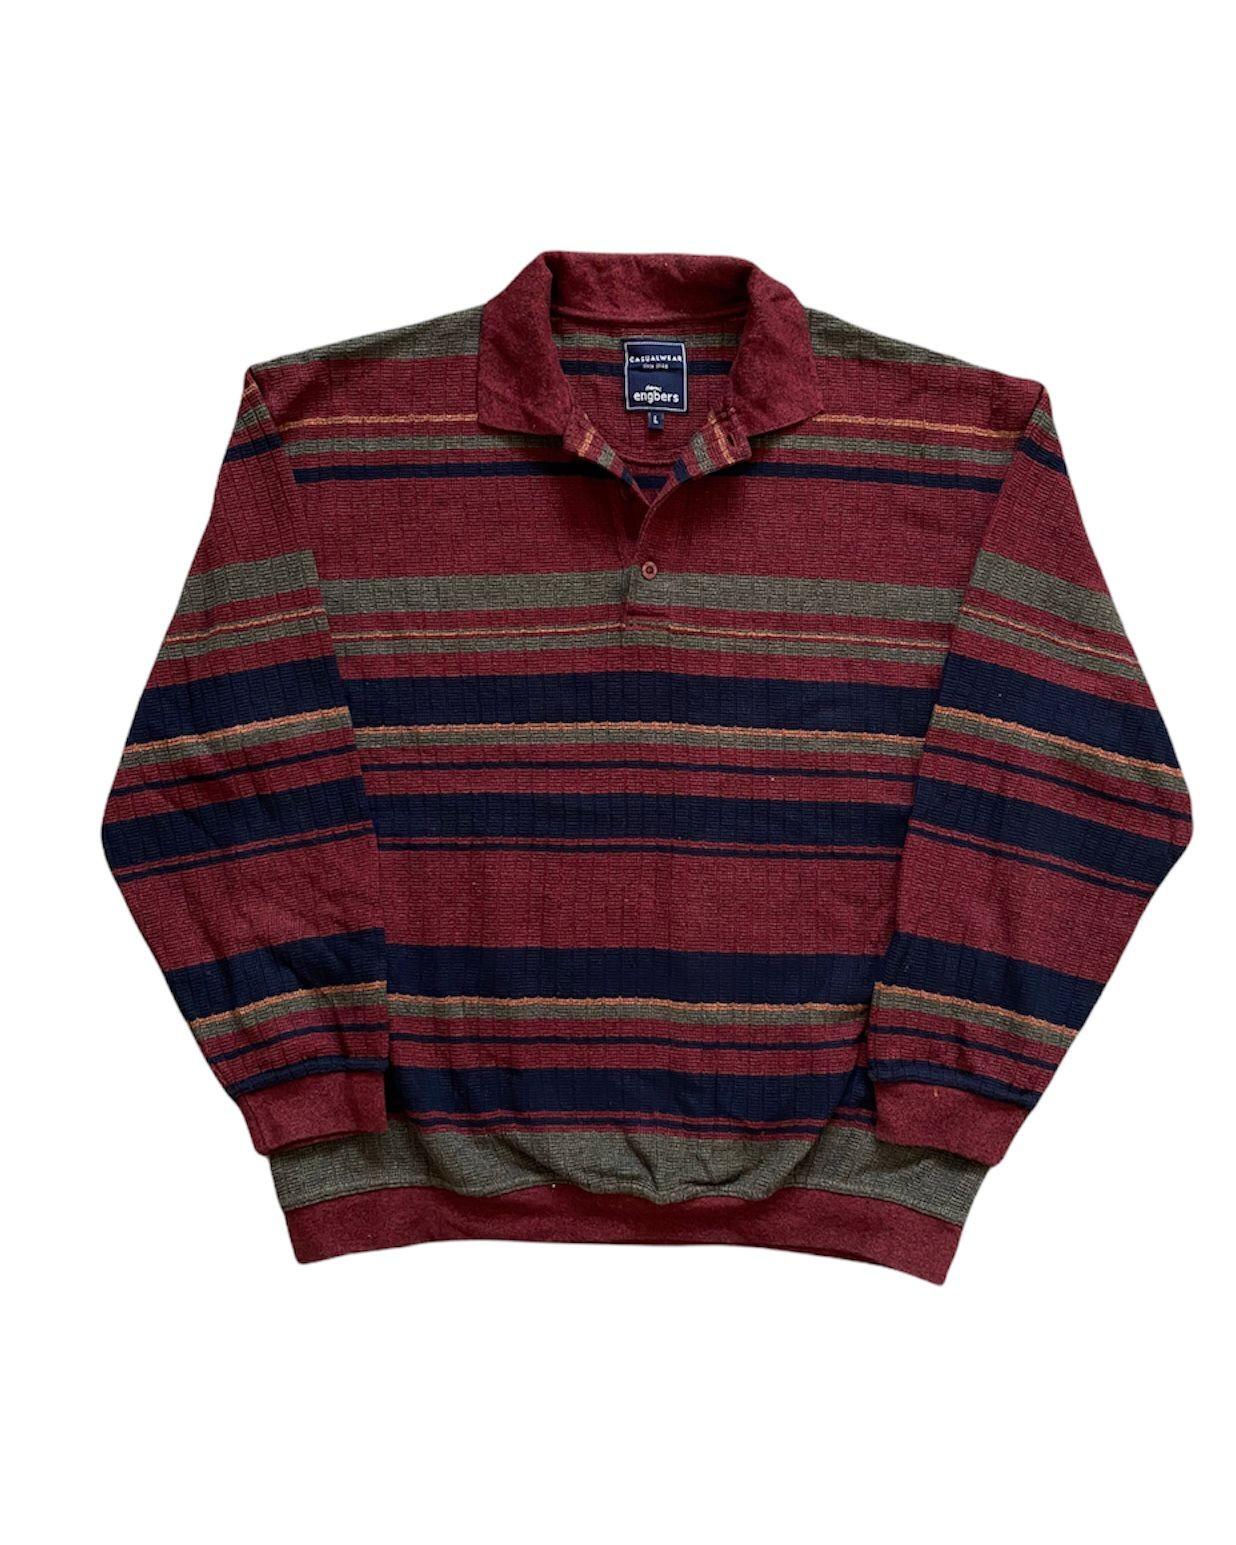 Engebers Vintage Polo Sweat (L)